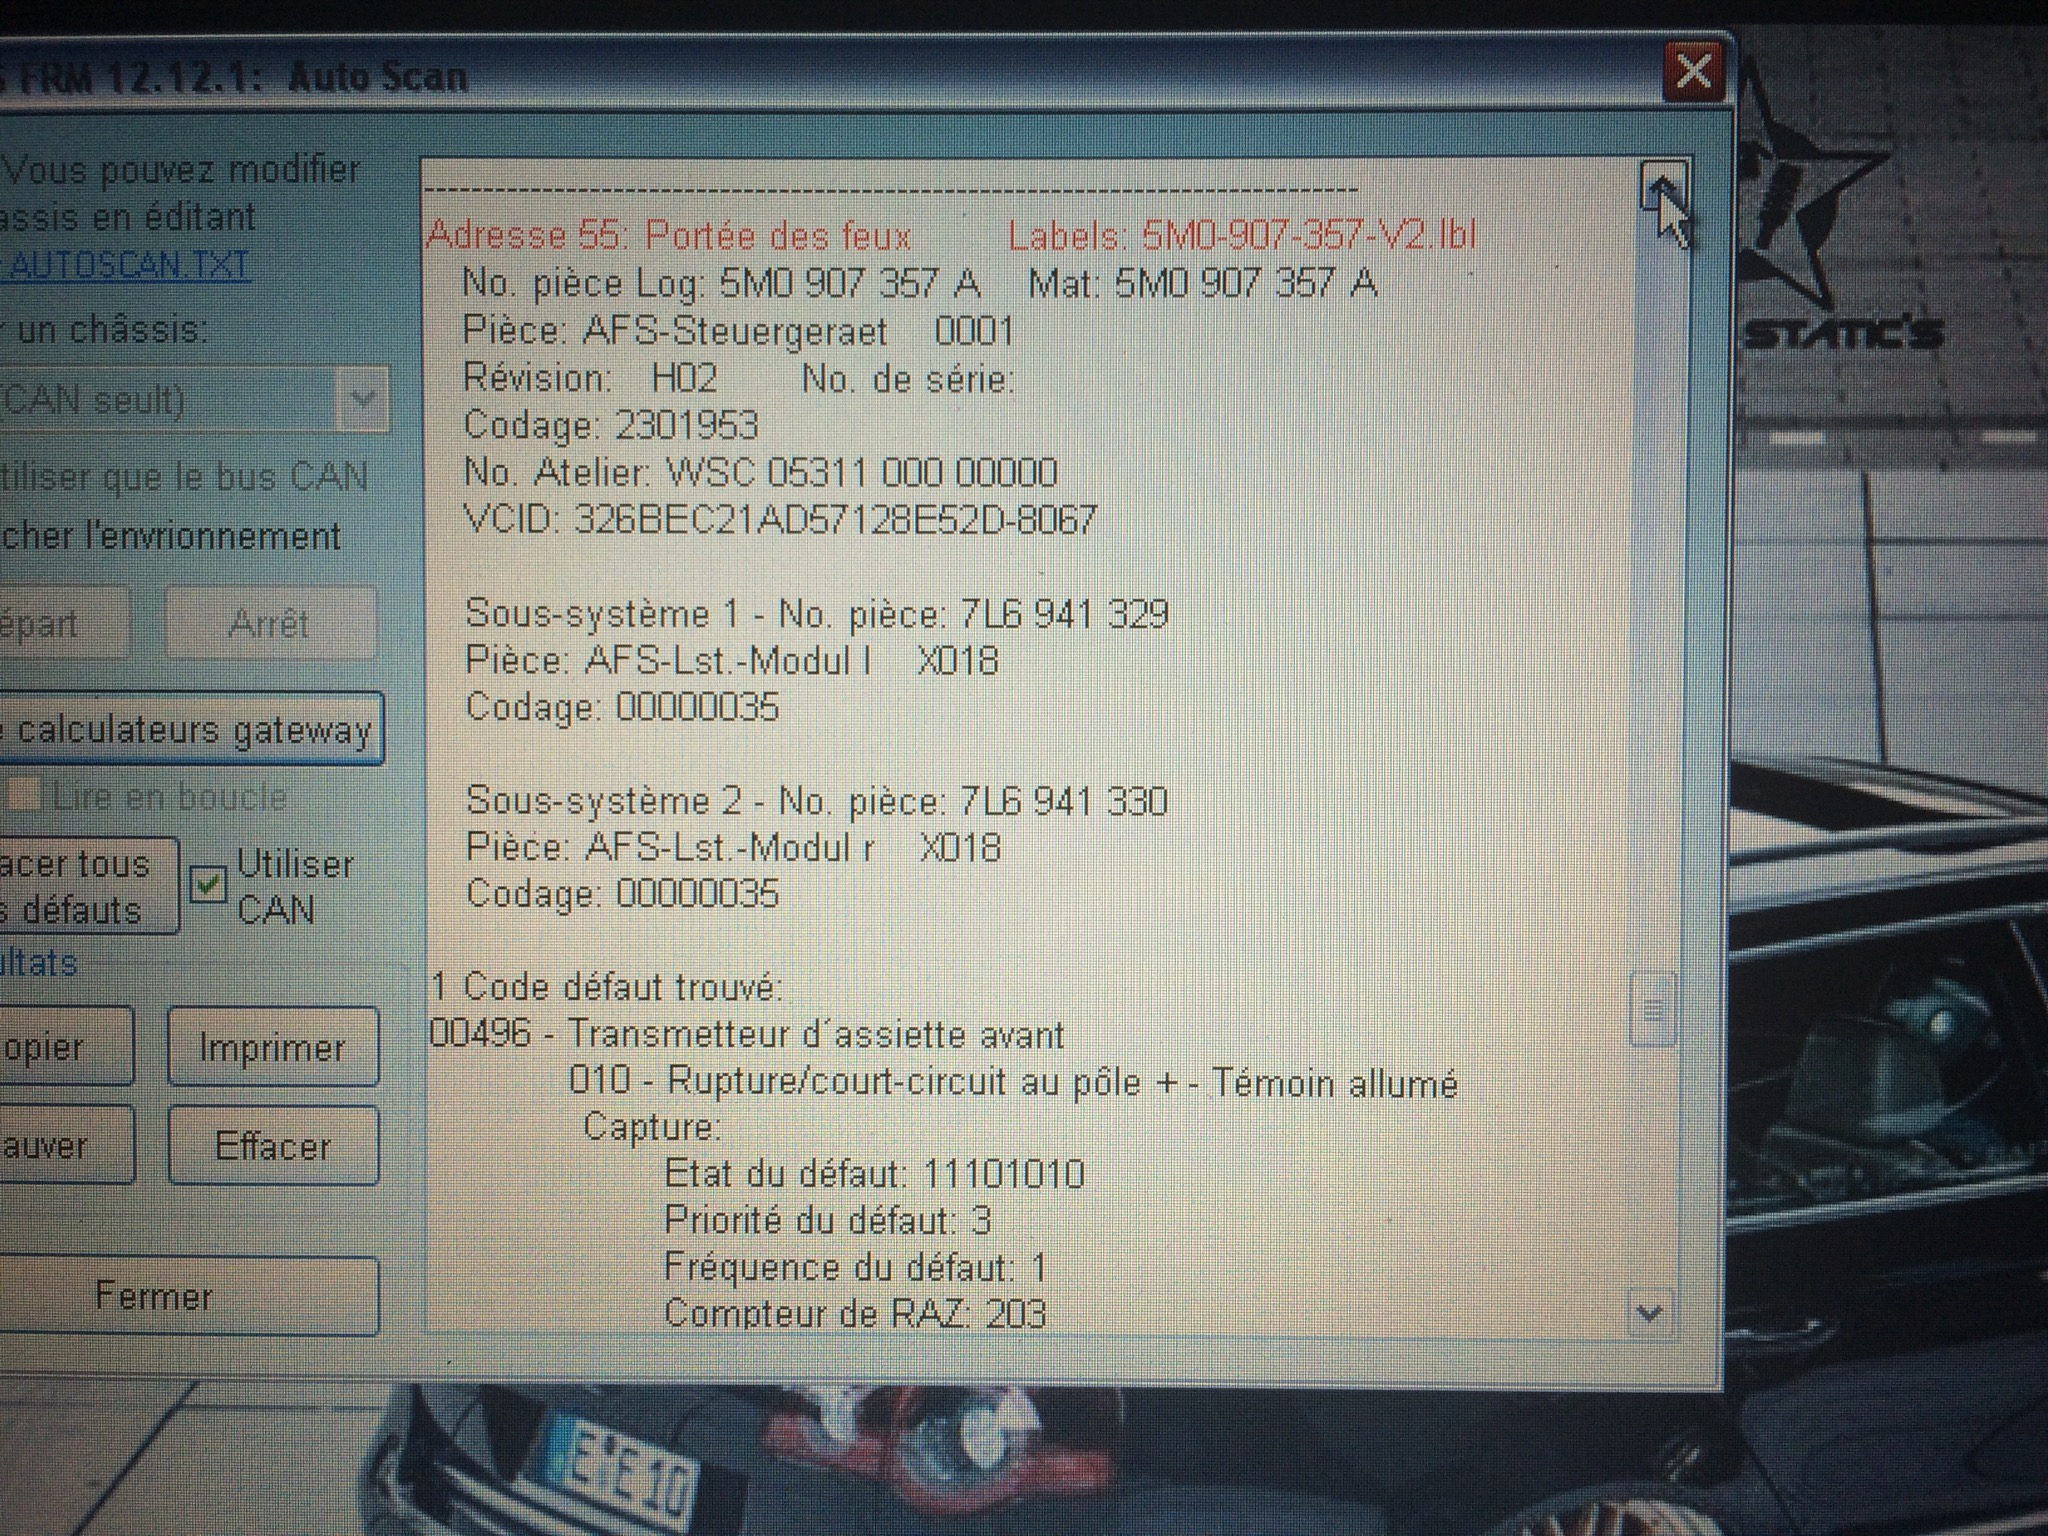 http://nsa38.casimages.com/img/2016/06/20/160620021105486609.jpg